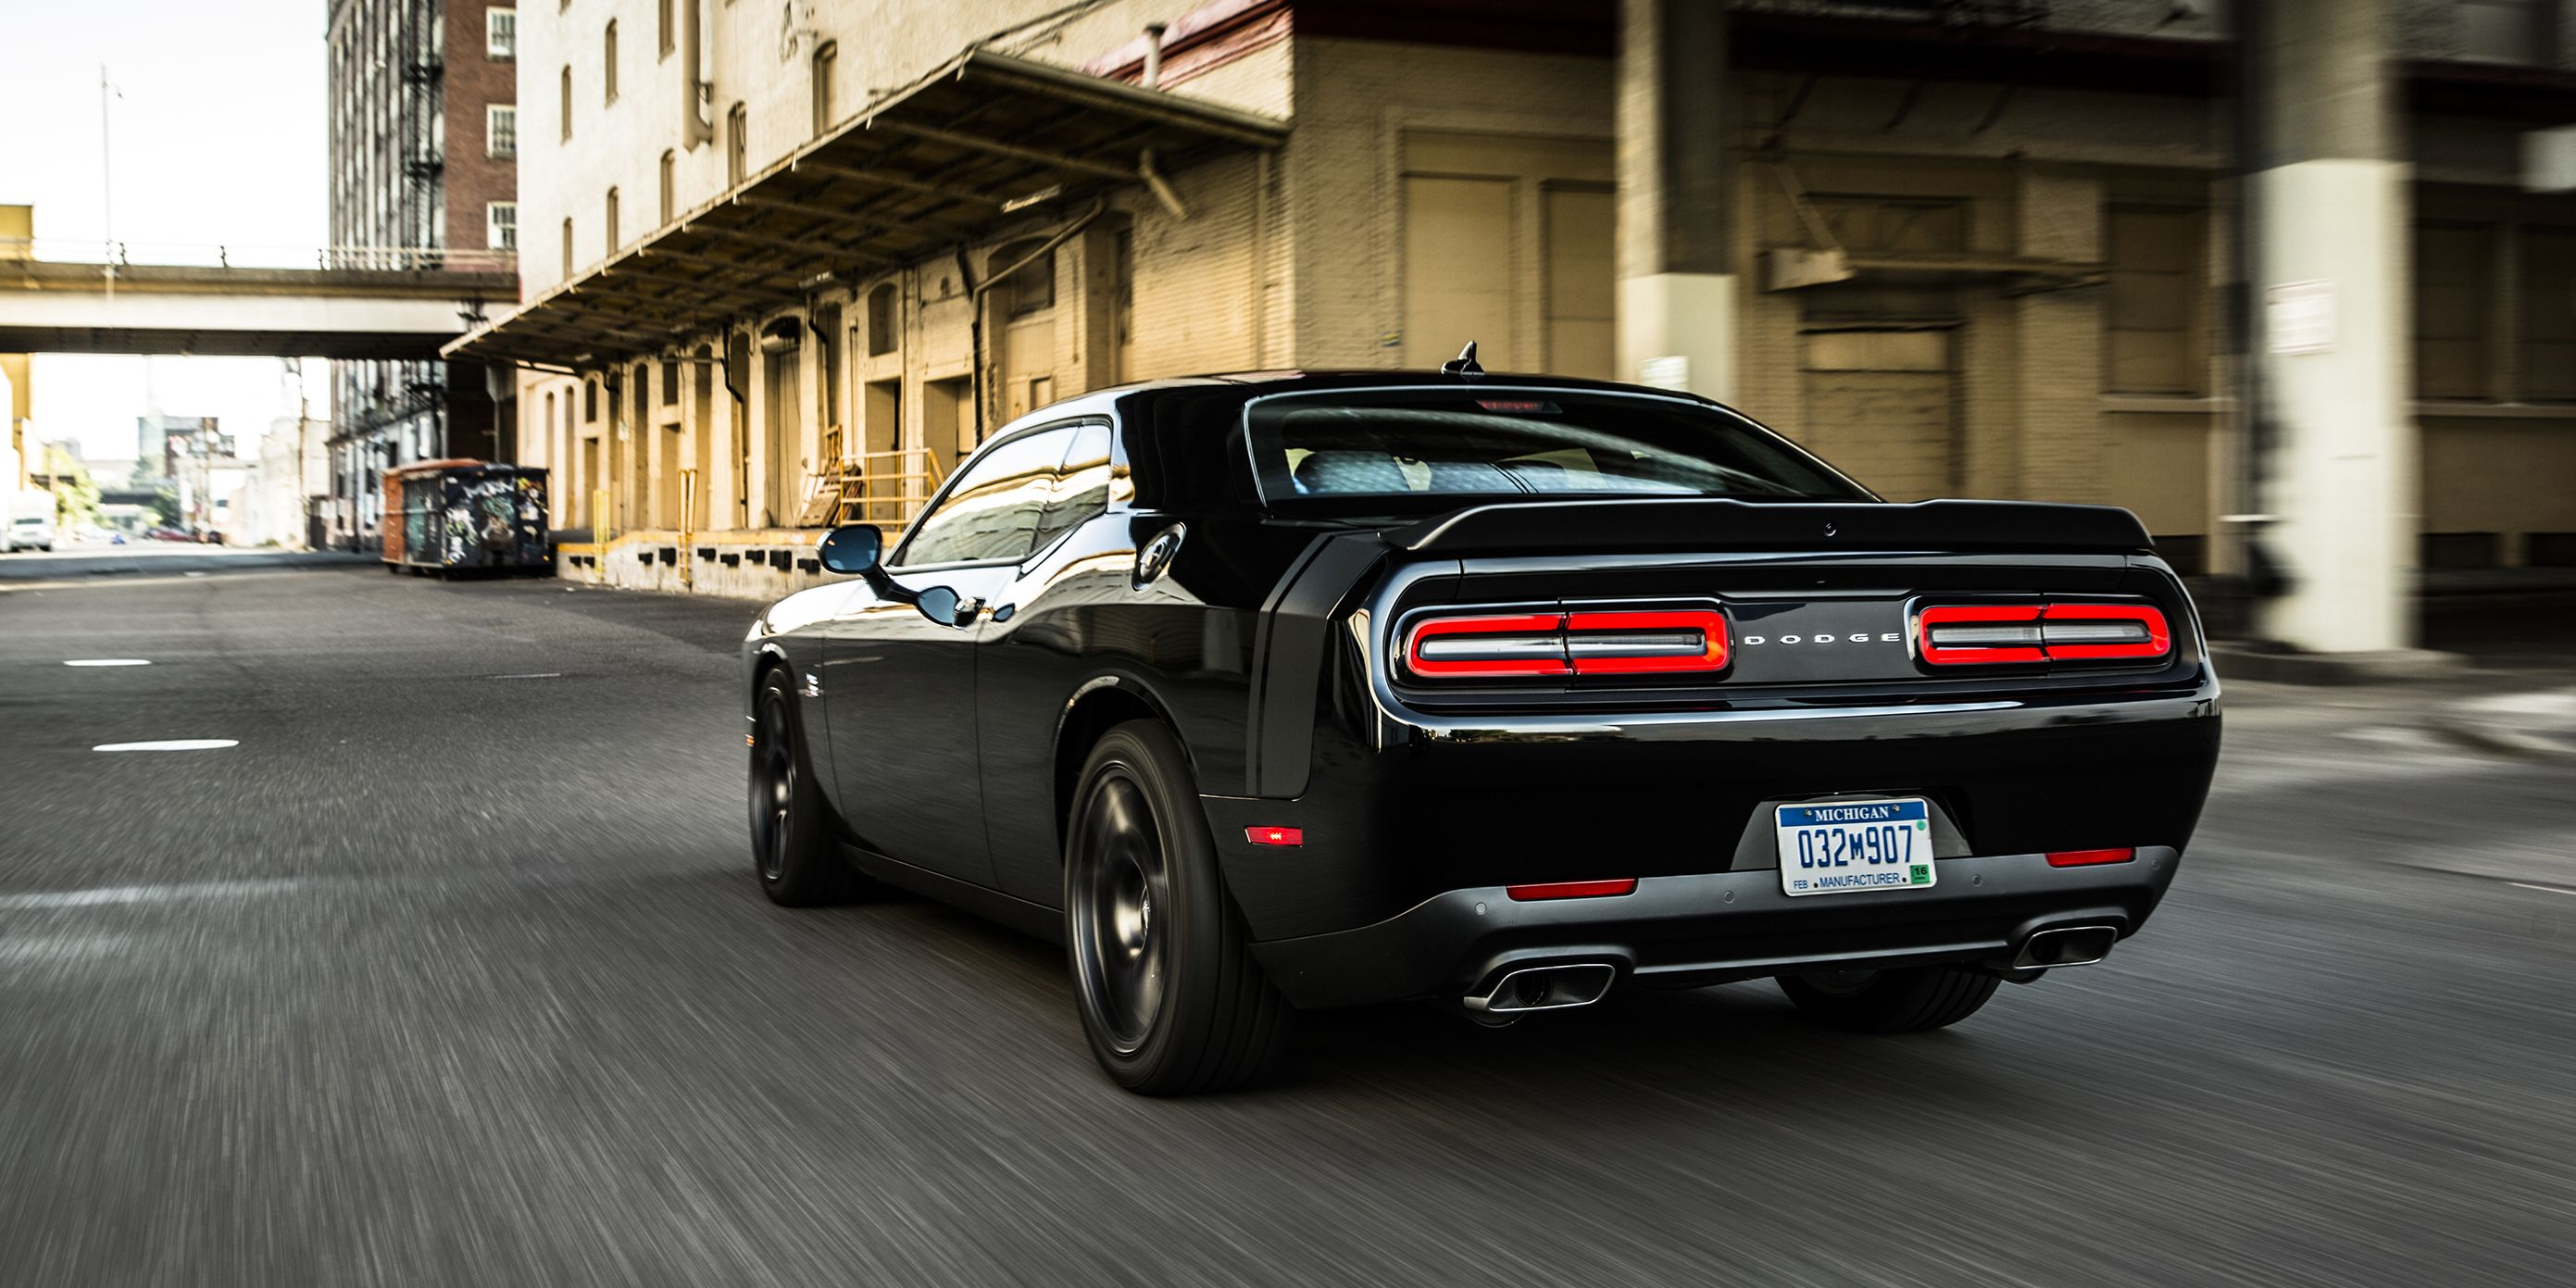 16 Fastest Cars Under 40k In 2018 Most Powerful Sedans Sports